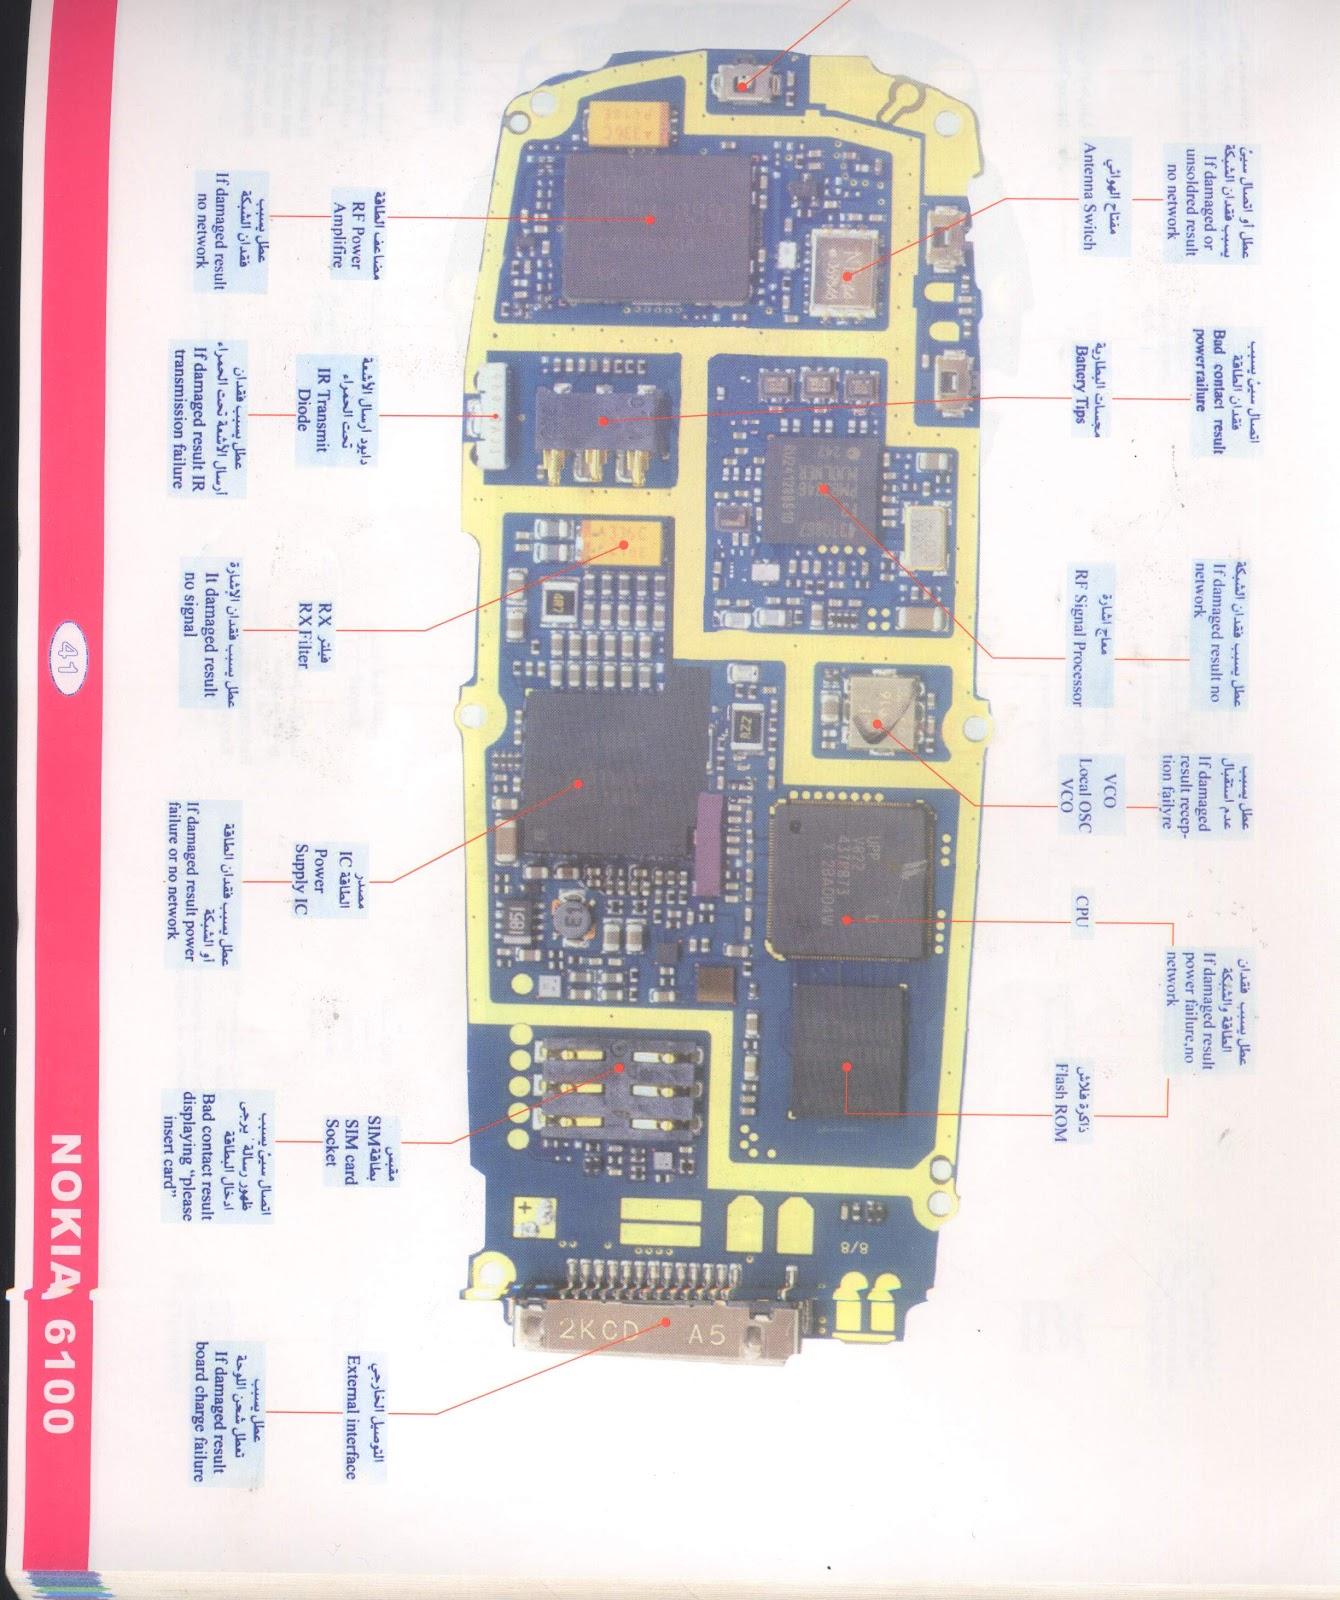 Nokia 6100 Circuit Board Details